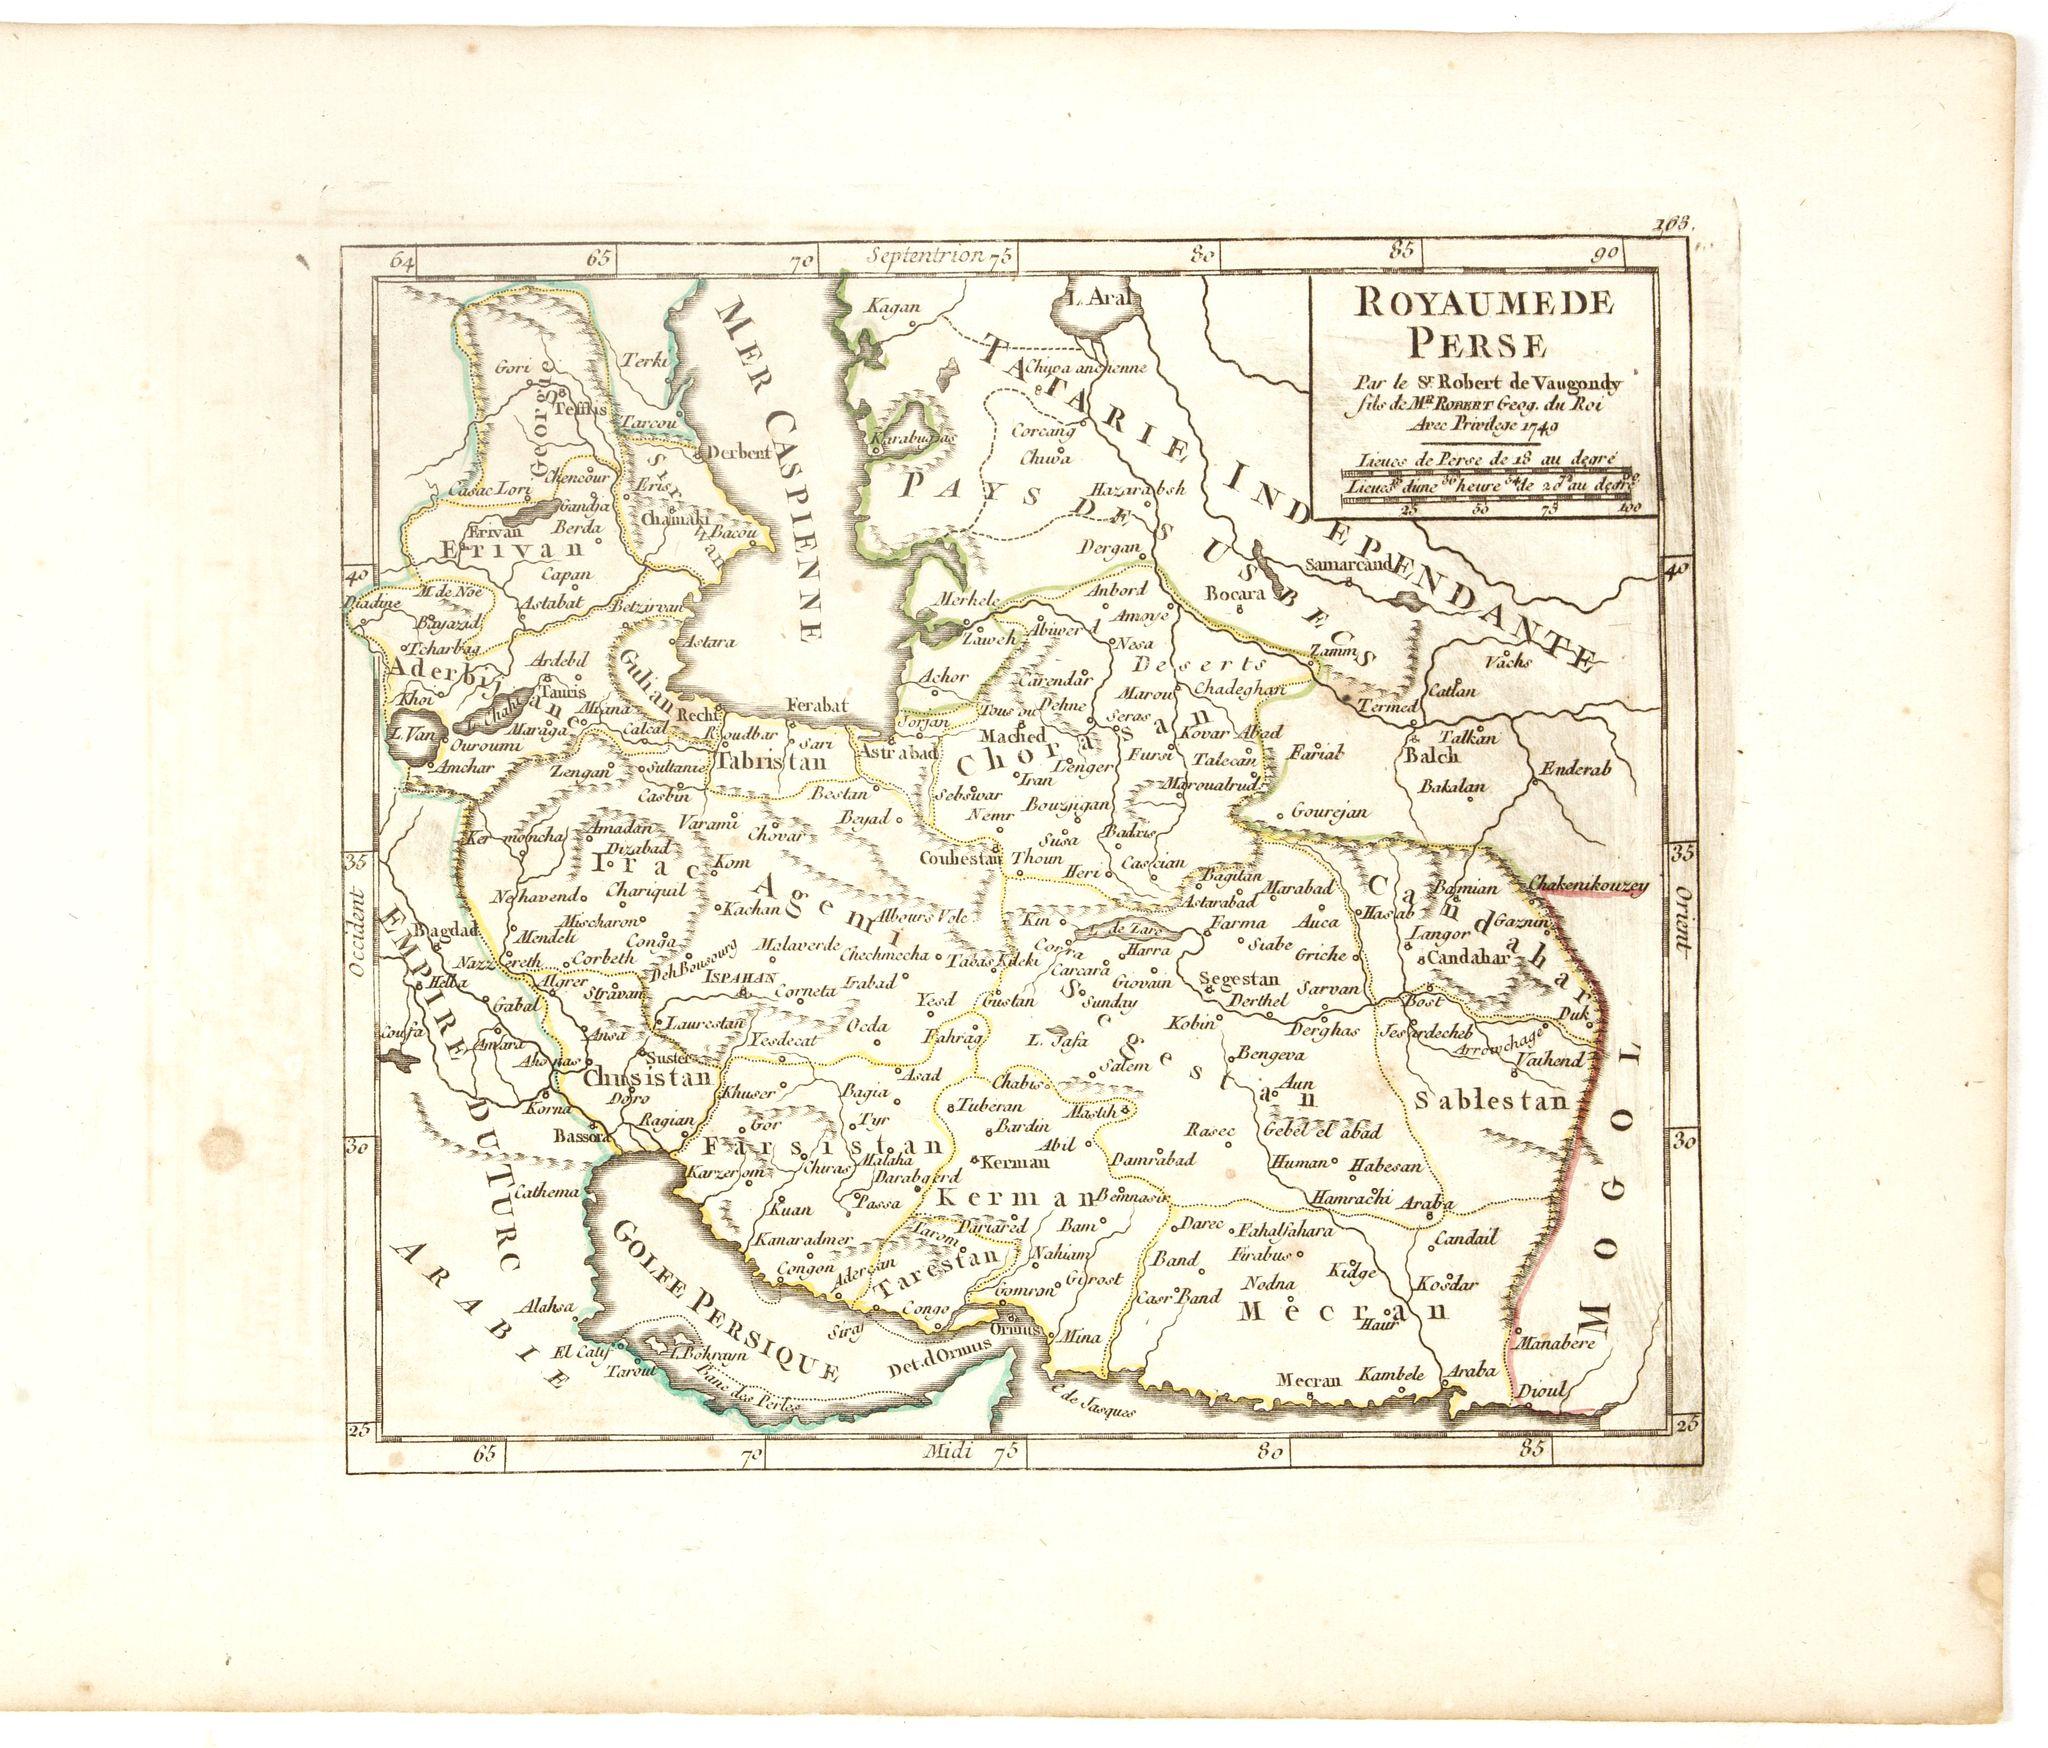 VAUGONDY, R. de -  Royaume de Perse  Par le Sr. Robert de Vaugondy fils de Mr. Robert Geog. Ord du Roi avec Privilege 1749.